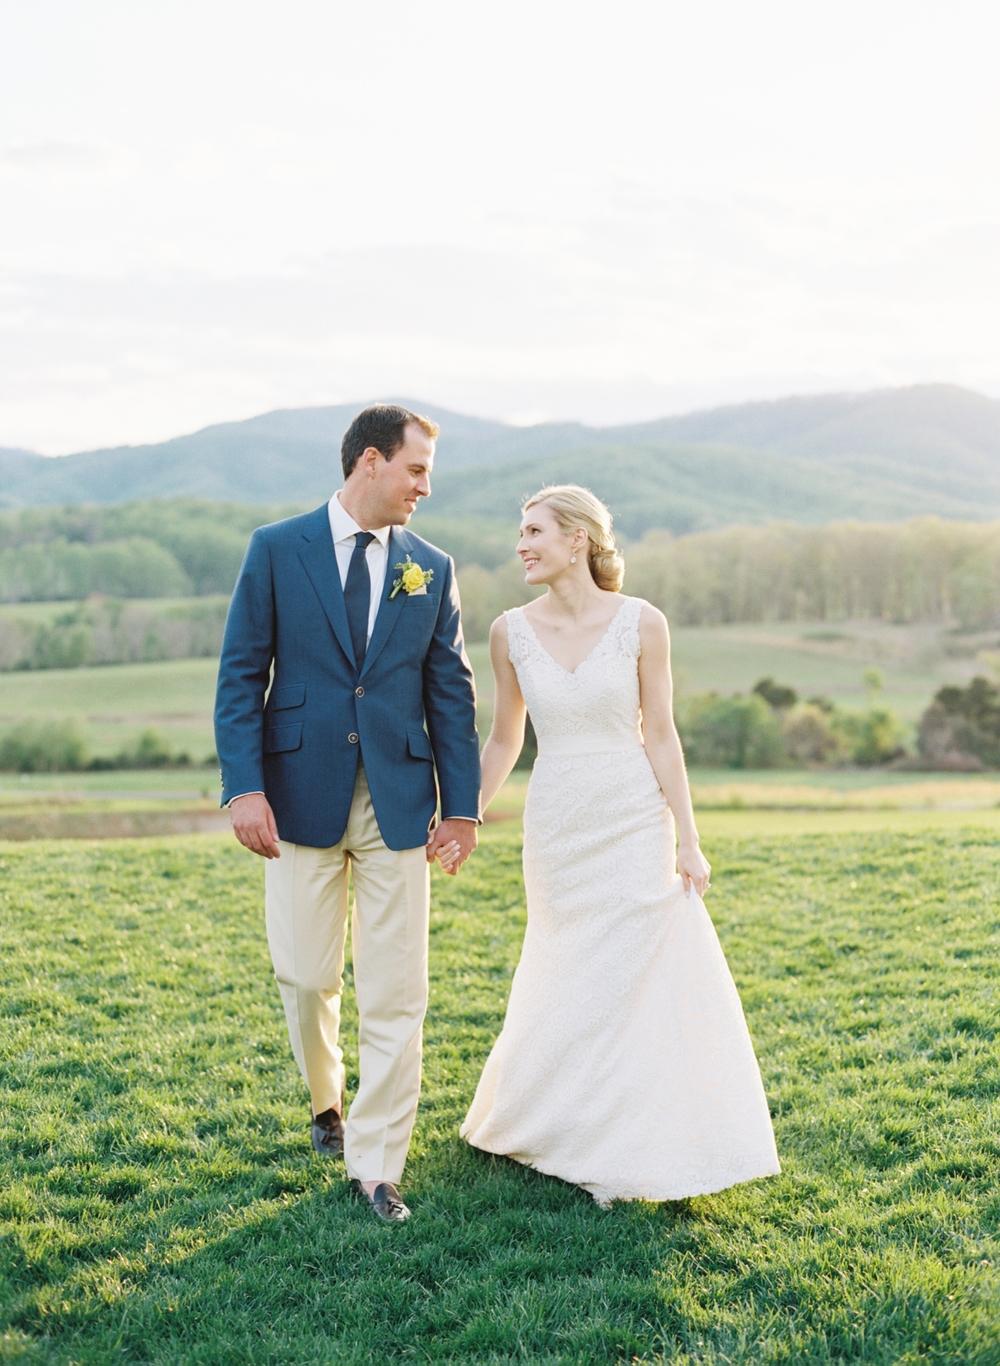 blue-yellow-wedding-groom-bride-dress